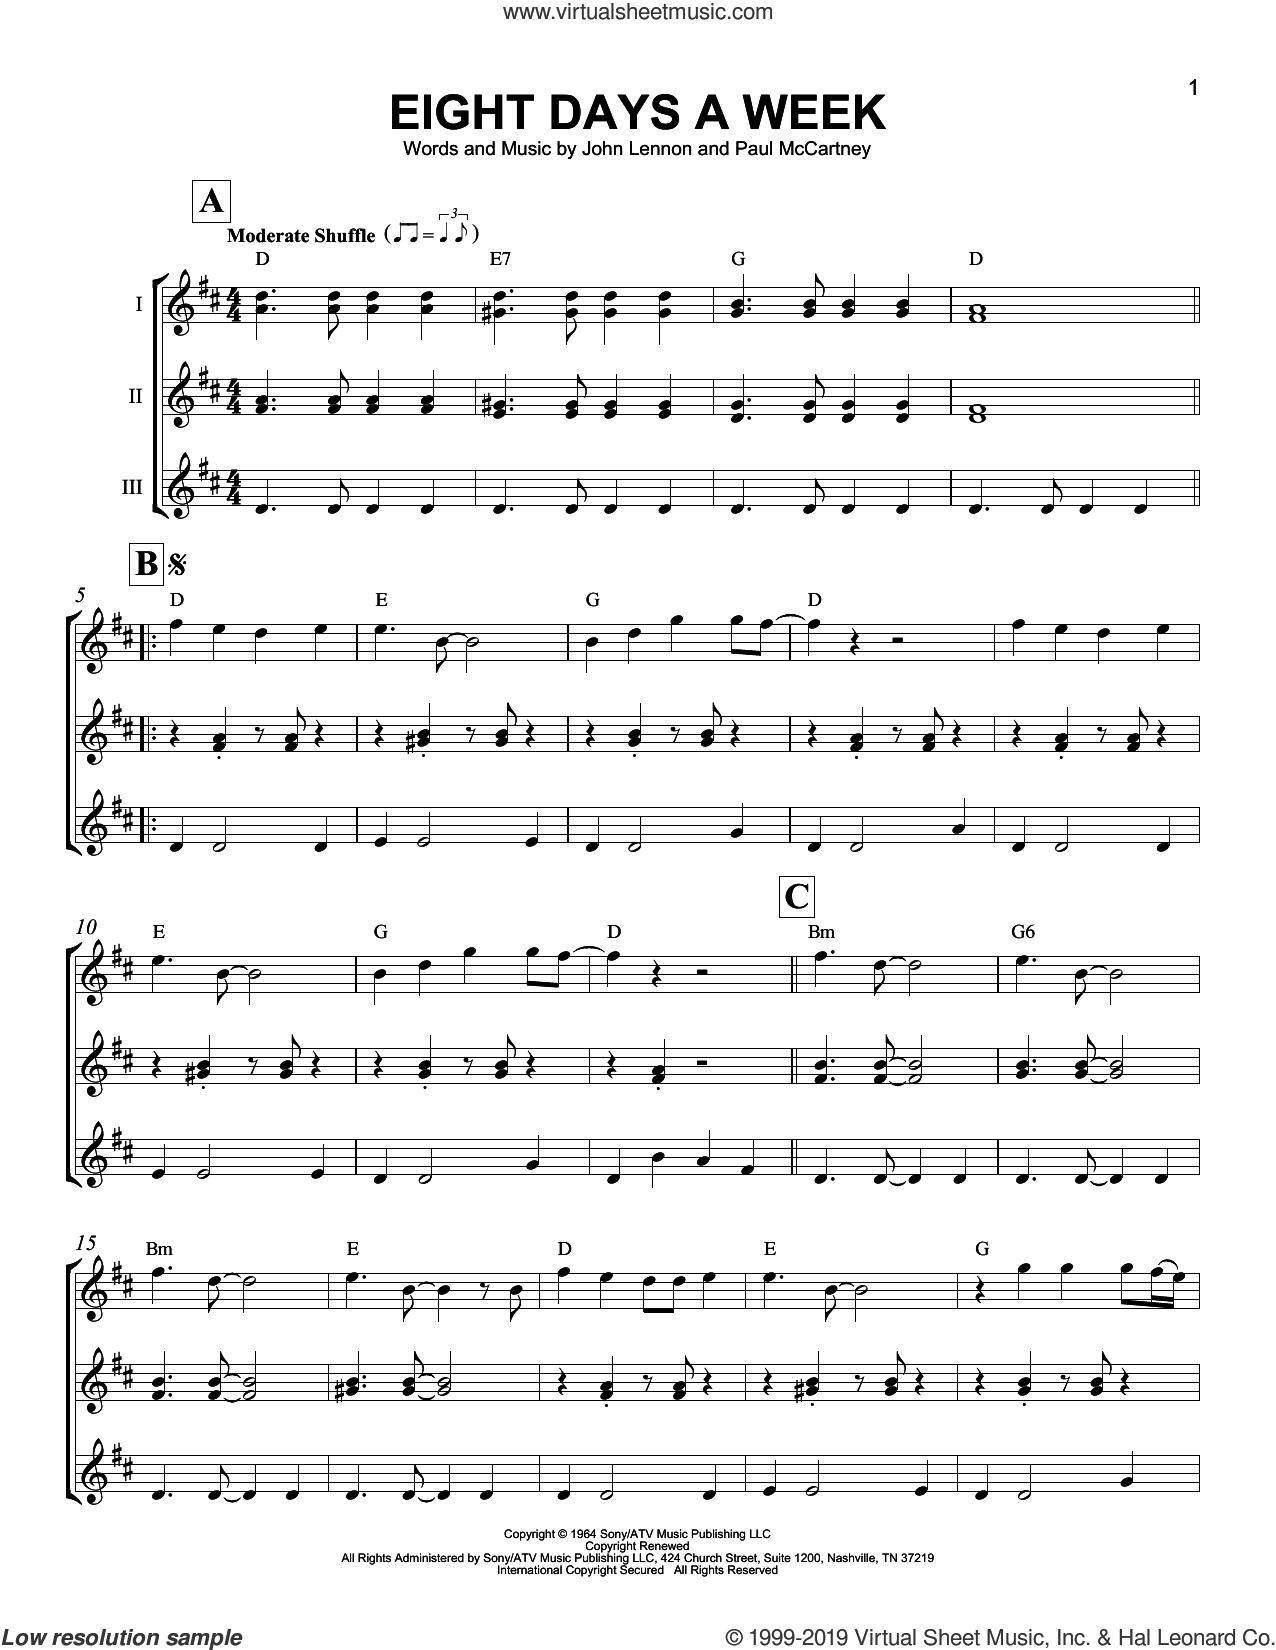 Eight Days A Week sheet music for ukulele ensemble by The Beatles, John Lennon and Paul McCartney, intermediate skill level